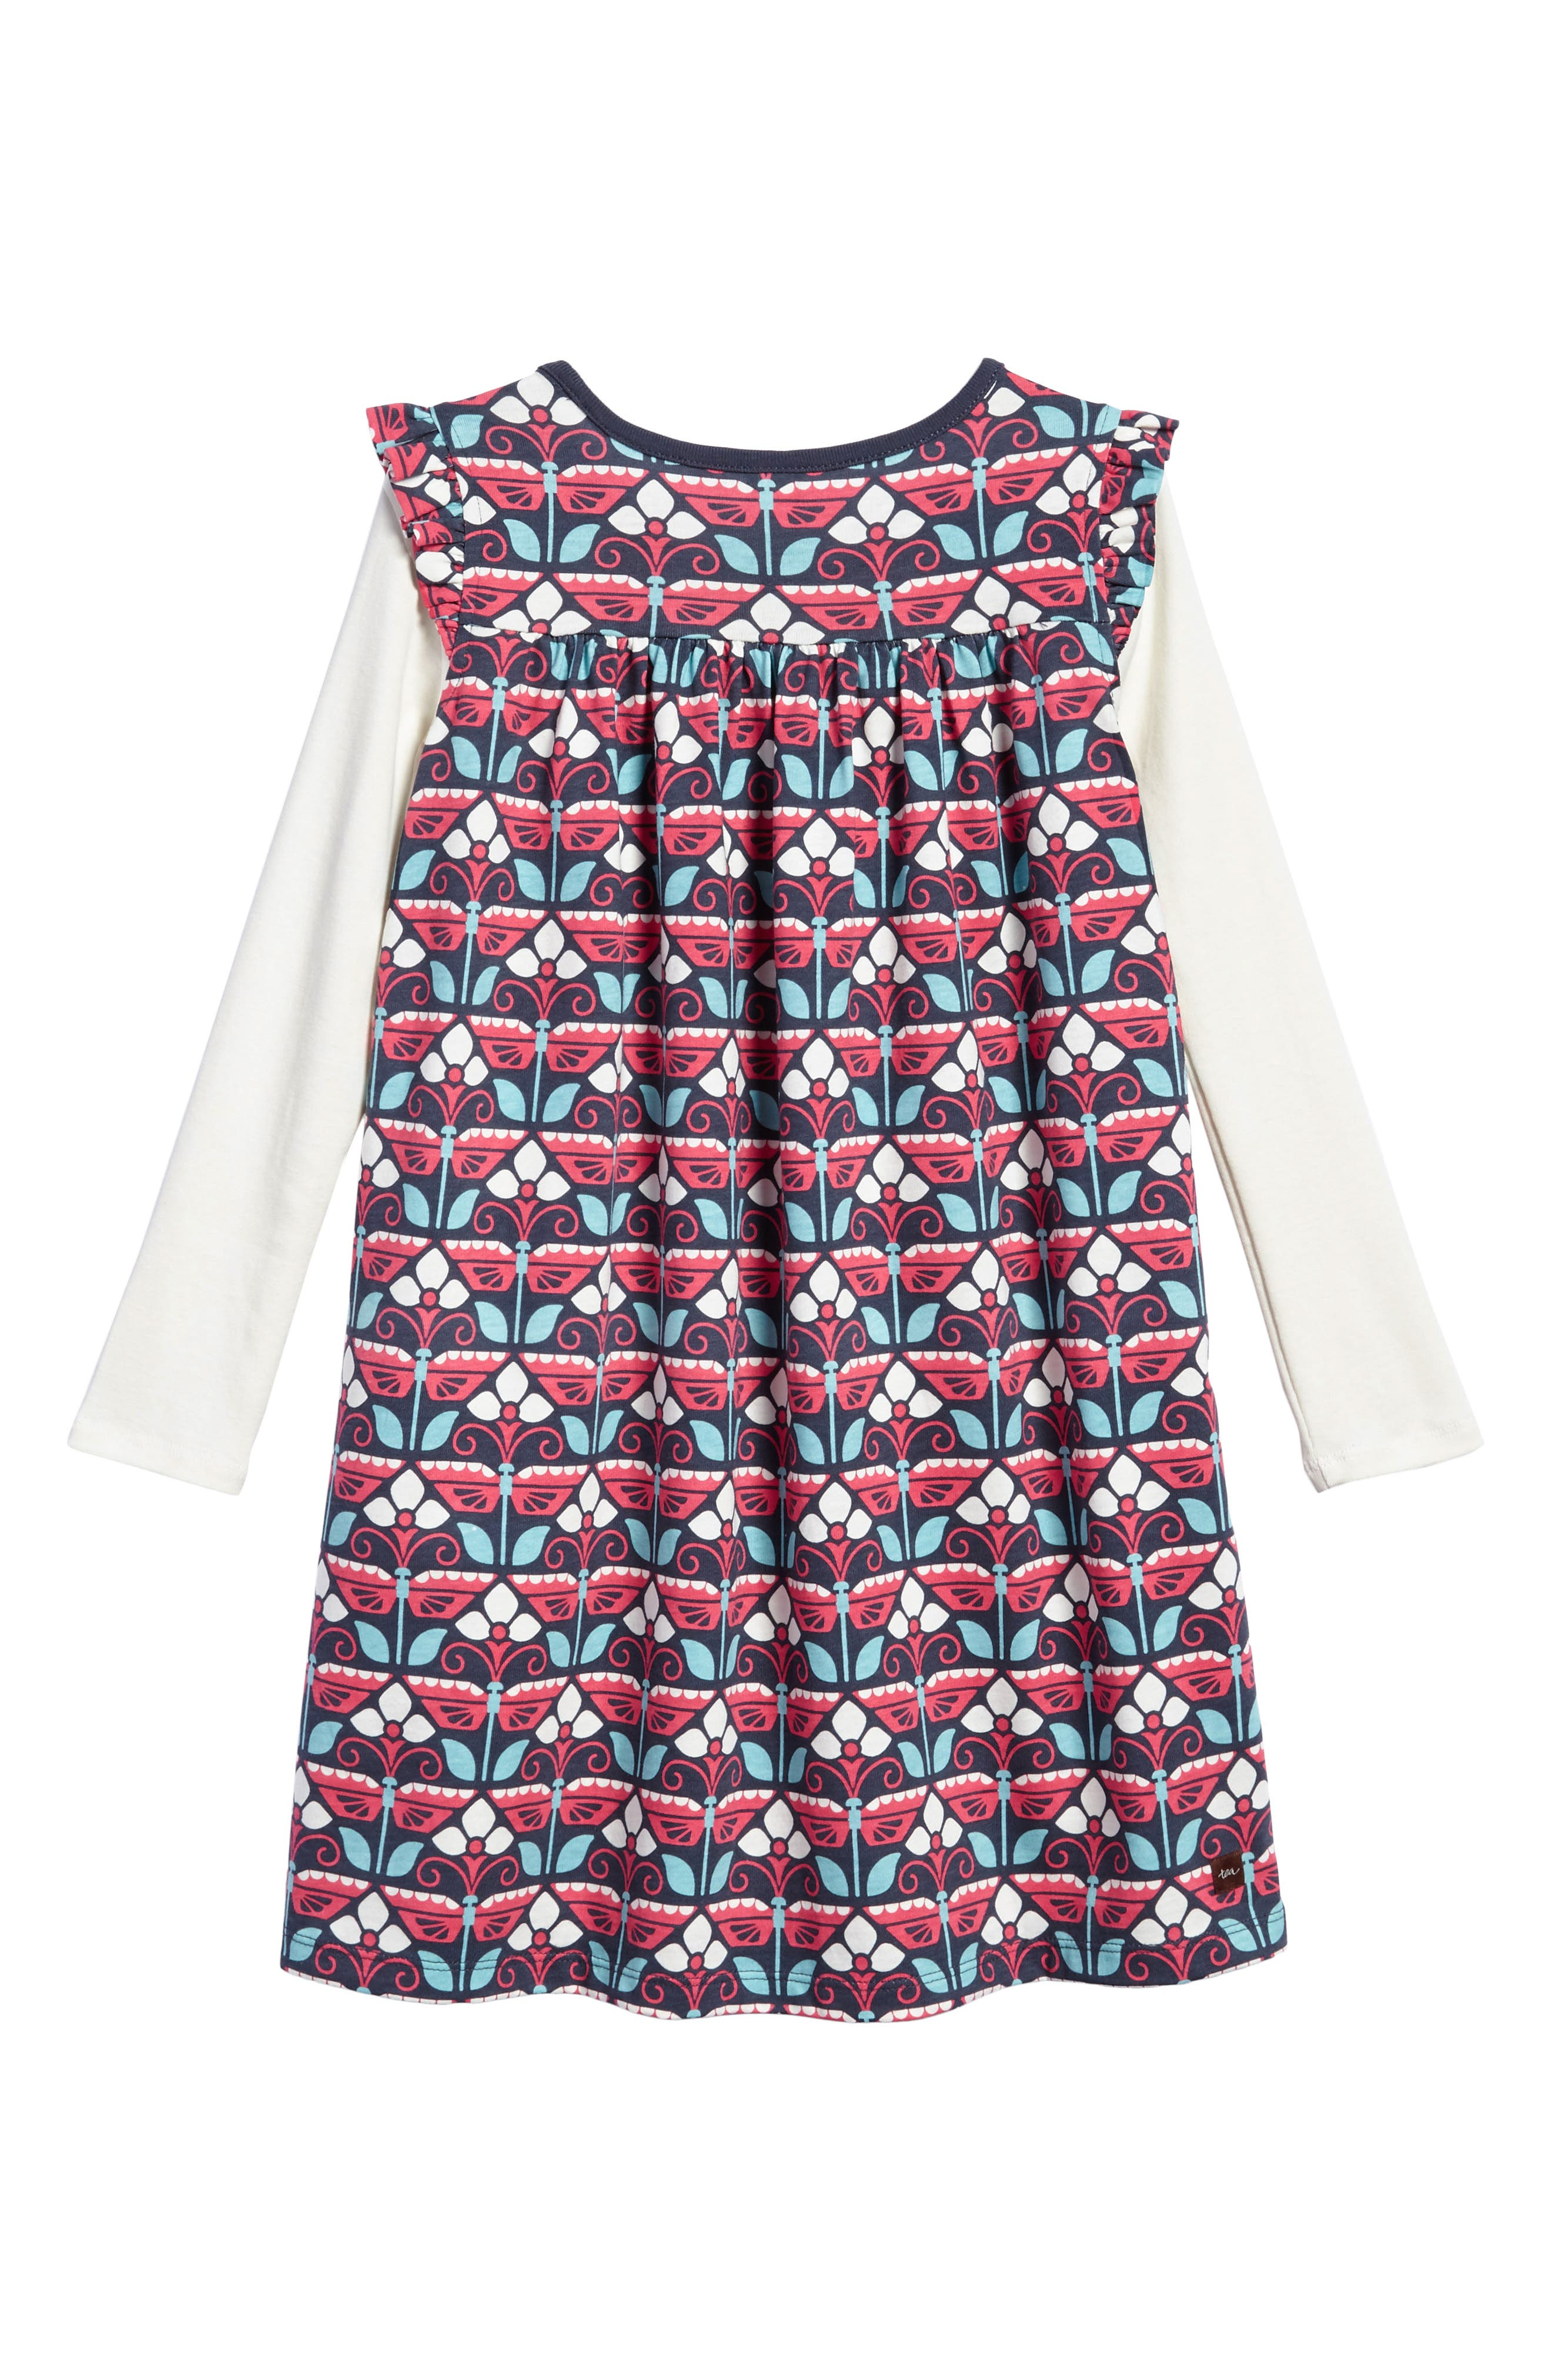 Kaleidoscope Dress,                             Alternate thumbnail 2, color,                             411